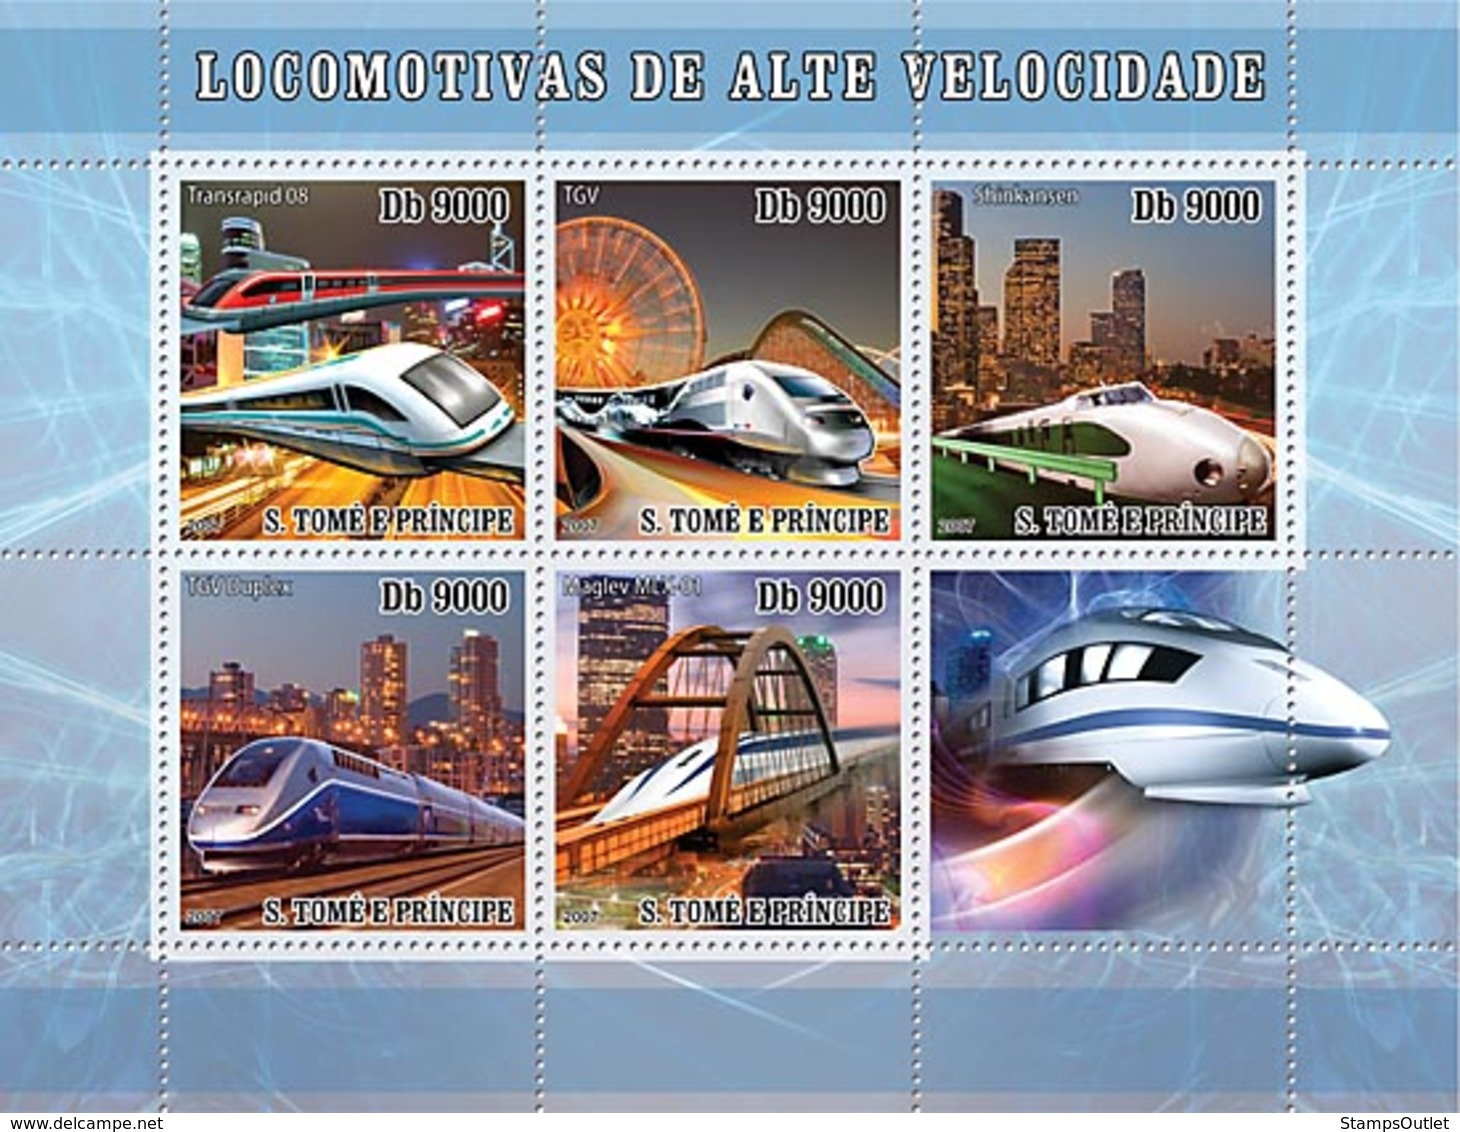 S. TOME & PRINCIPE 2007 - Speed Trains 5v - YT 2366-2370, Mi 3181-3185 - Sao Tome And Principe